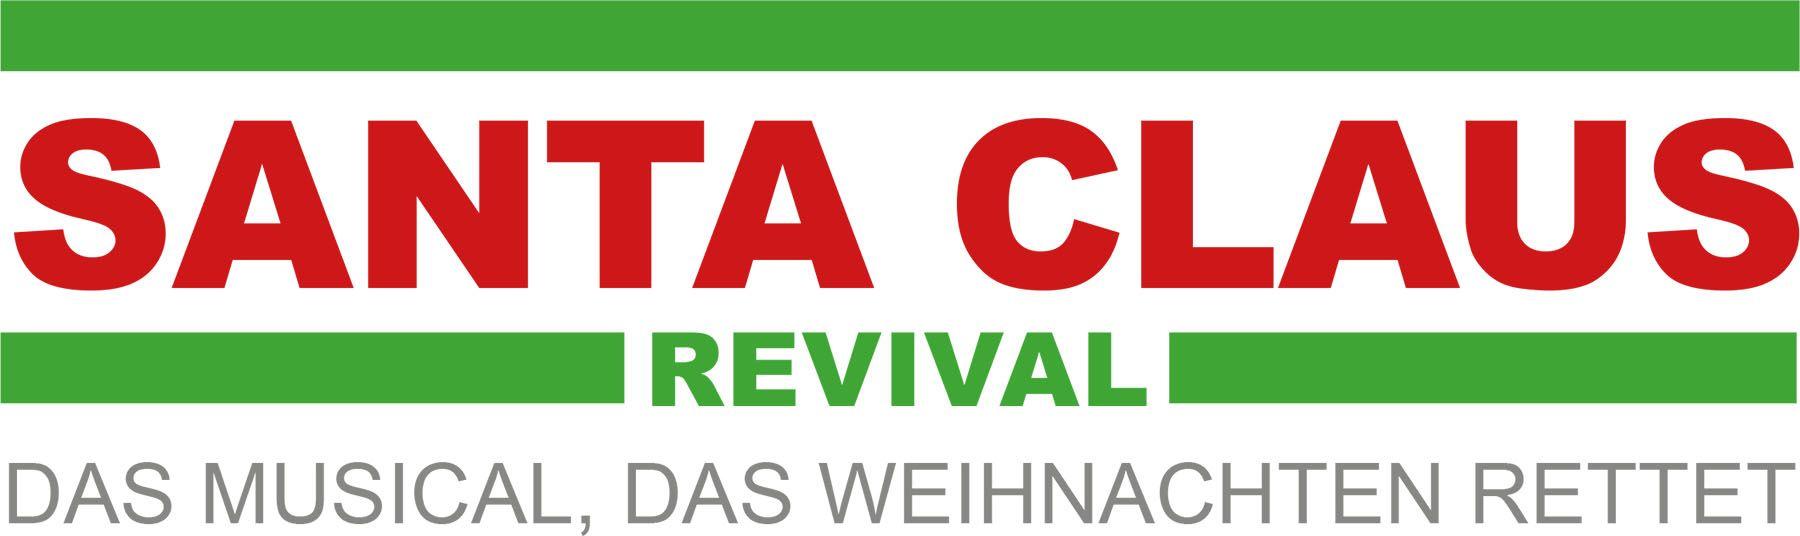 <h2>Santa Claus Revival App</h2>